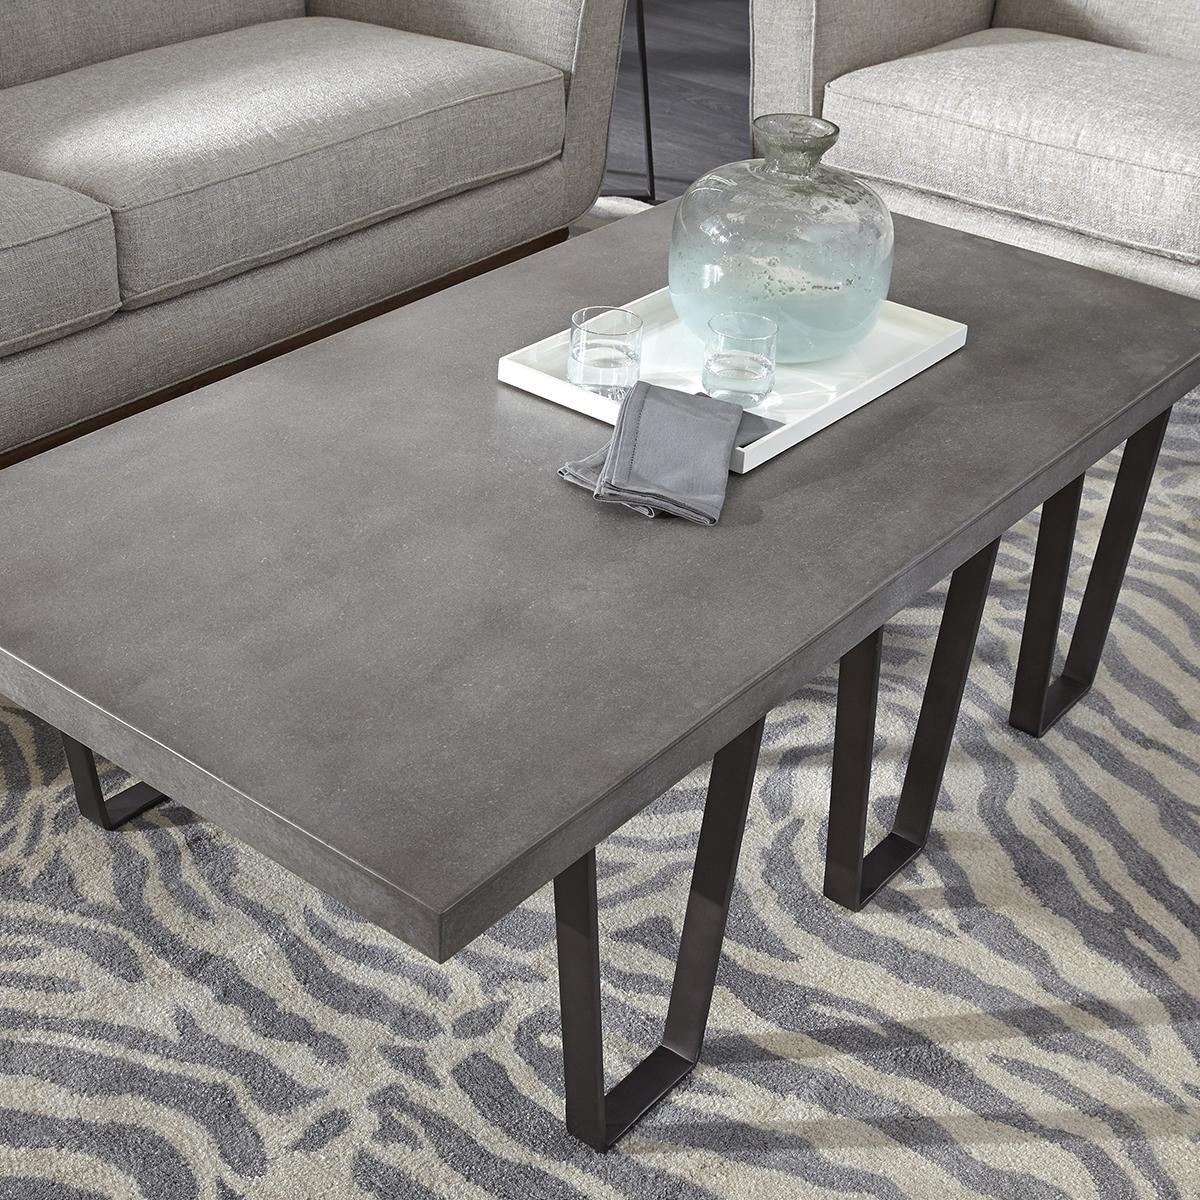 Accentric Approach Urban Eclectic Benton Coffee Table In Grey Nebraska Furniture Mart Coffee Table Coffee Table Grey Coffee Table Accents [ 1200 x 1200 Pixel ]